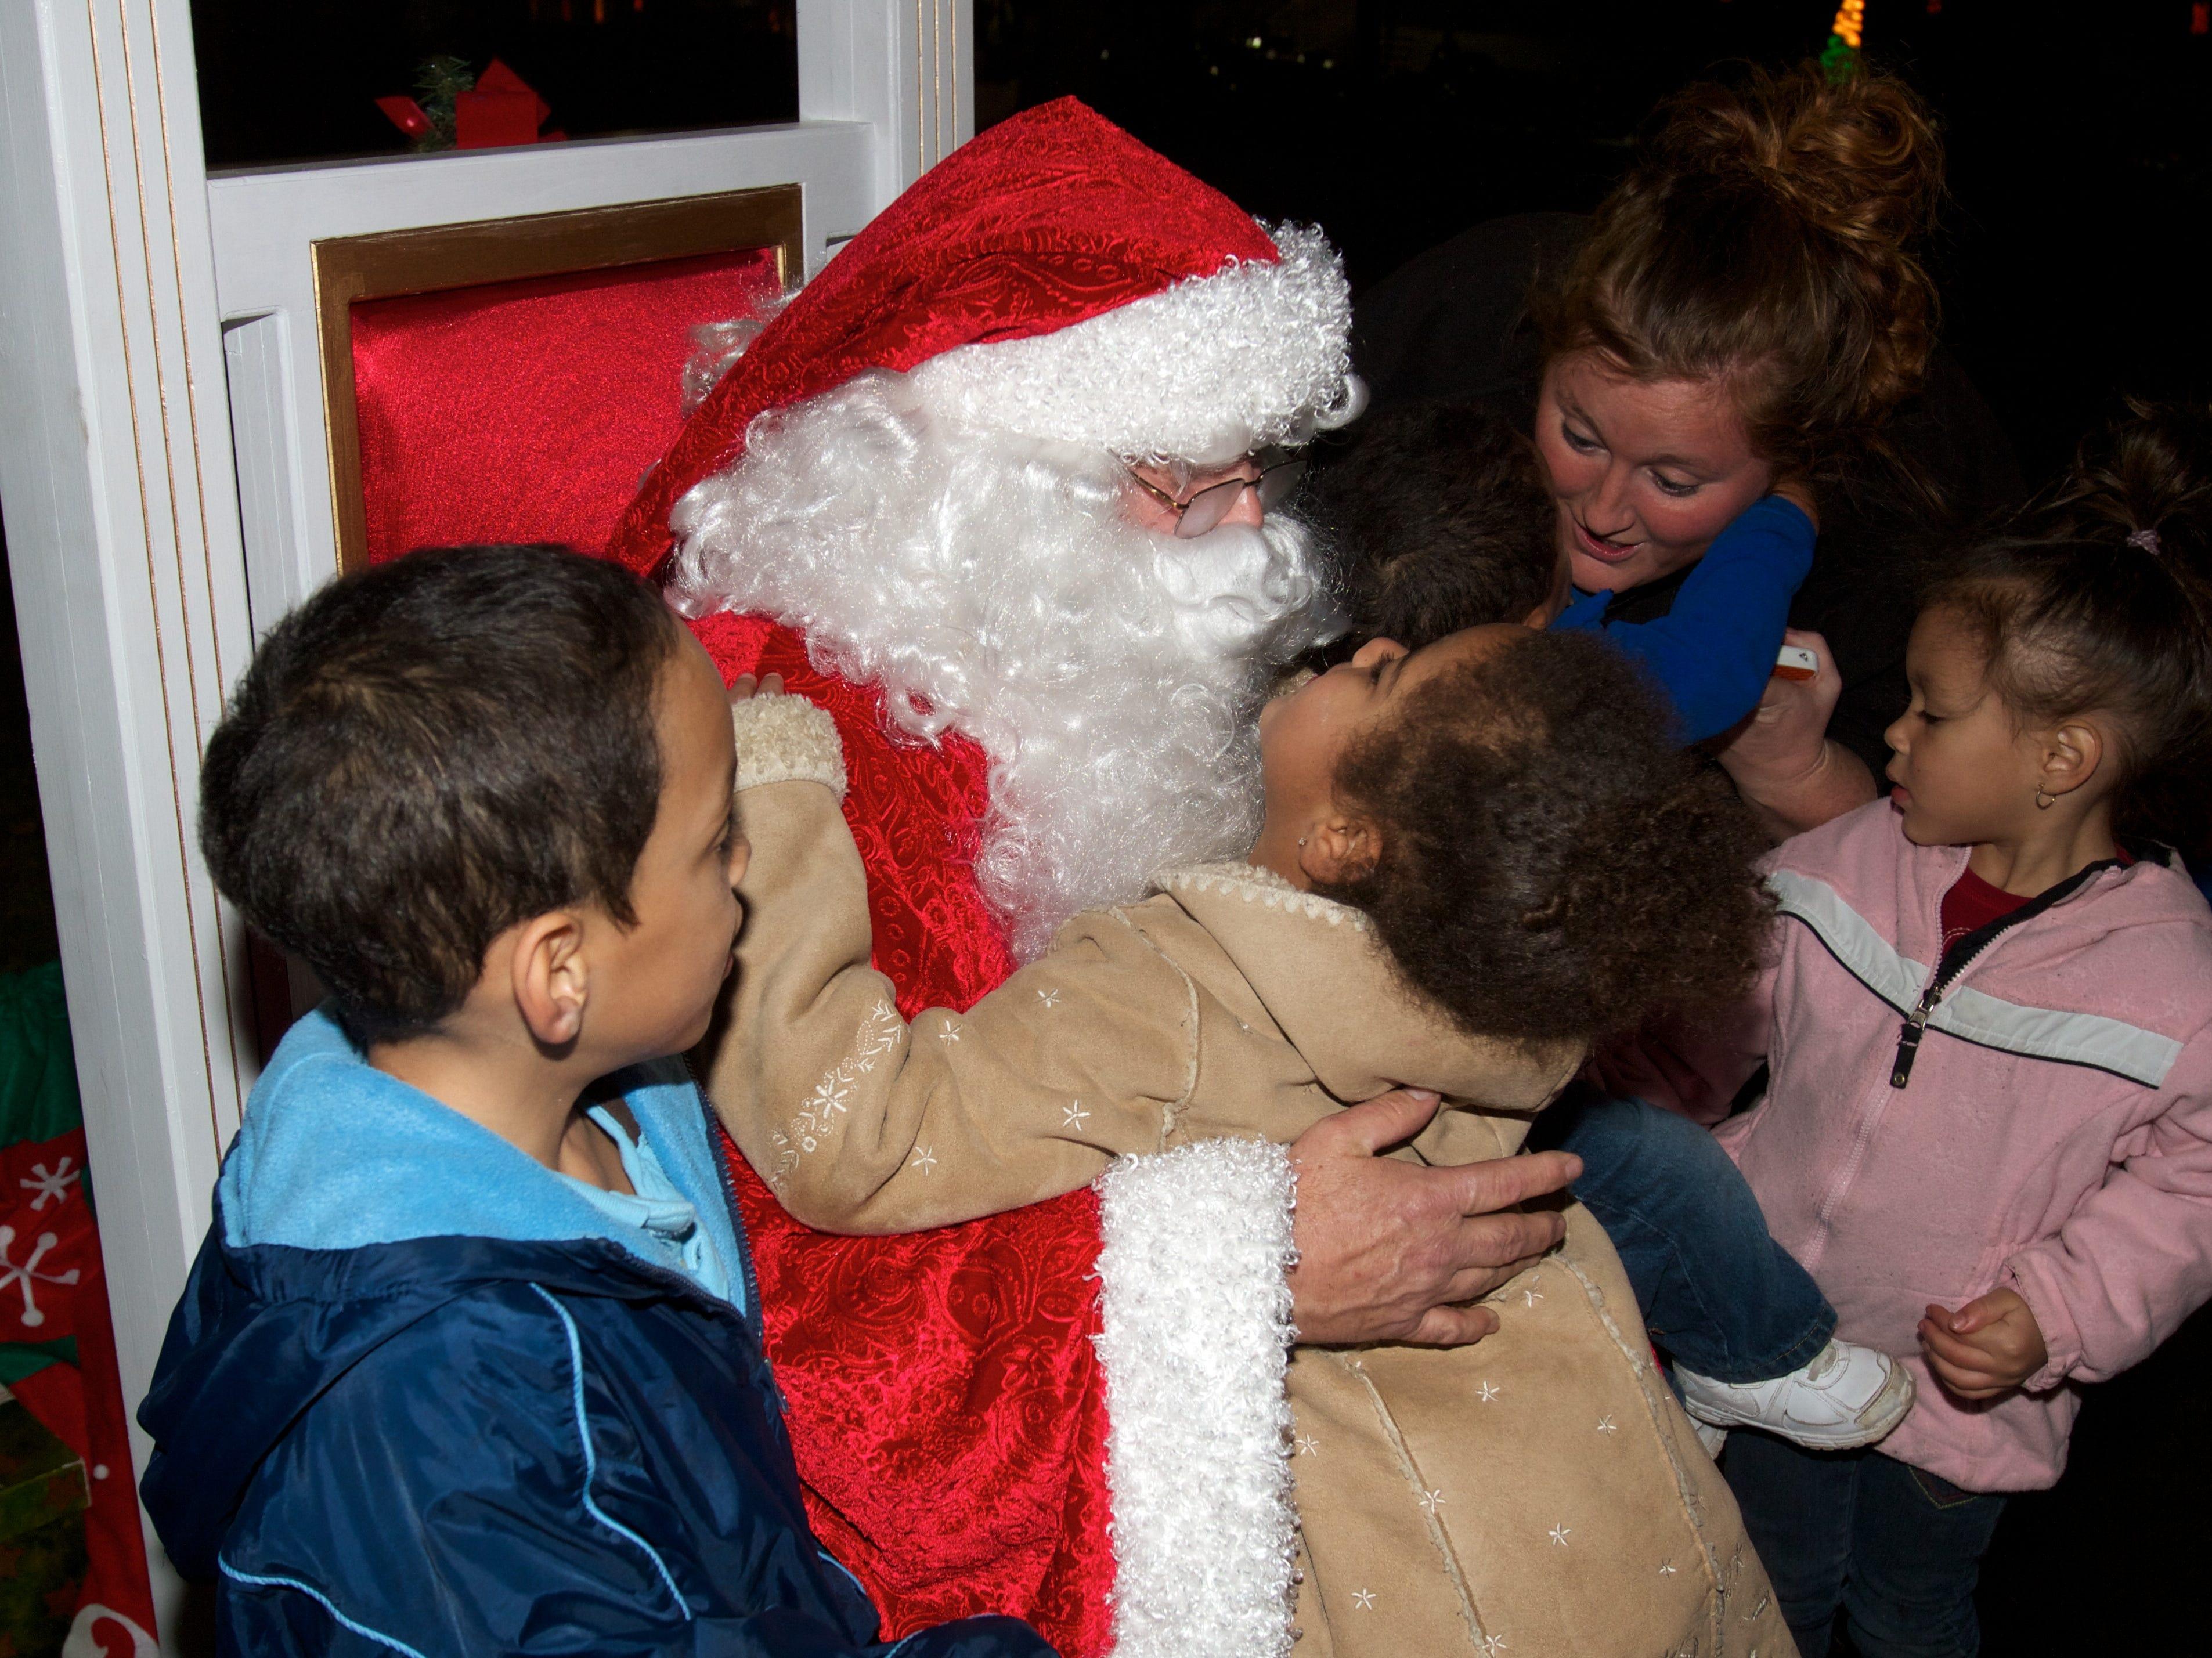 Visiting Santa are, from left, Darius Dawson, 6, Hazel Greymount, 5, Julian Cabage, 1, Tonya Cabage and Serenity Dawson, 4, on Friday, November 30, 2012 during Comcast Christmas at Chilhowee Park.